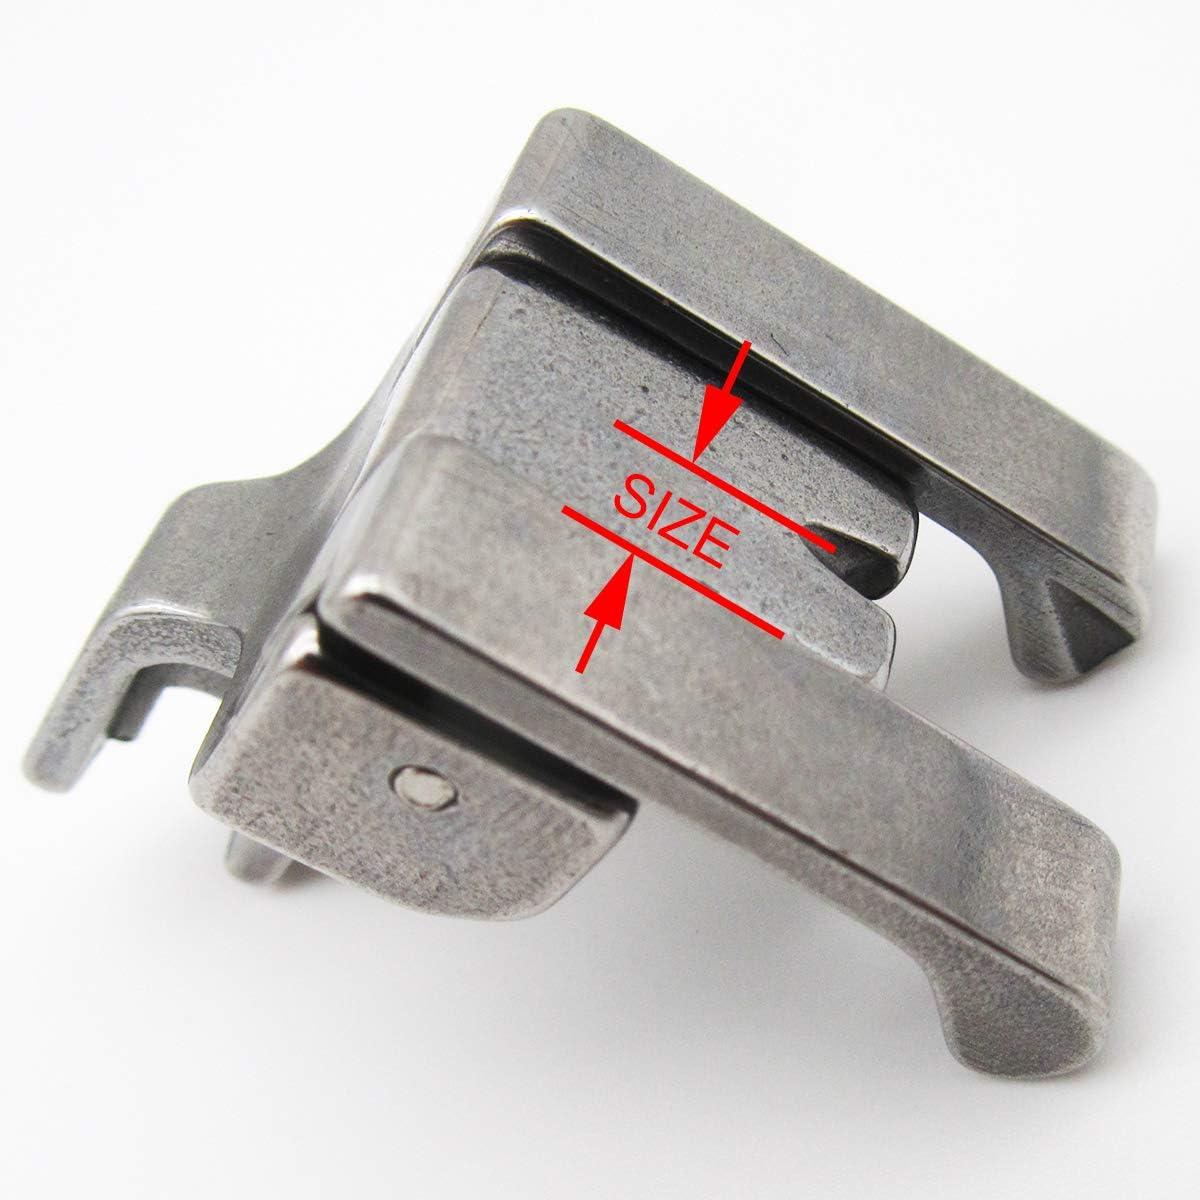 kunpeng/ /# CD 1pcs doble compensaci/ón top-stitching pie prensatelas para m/áquinas de coser Industrial